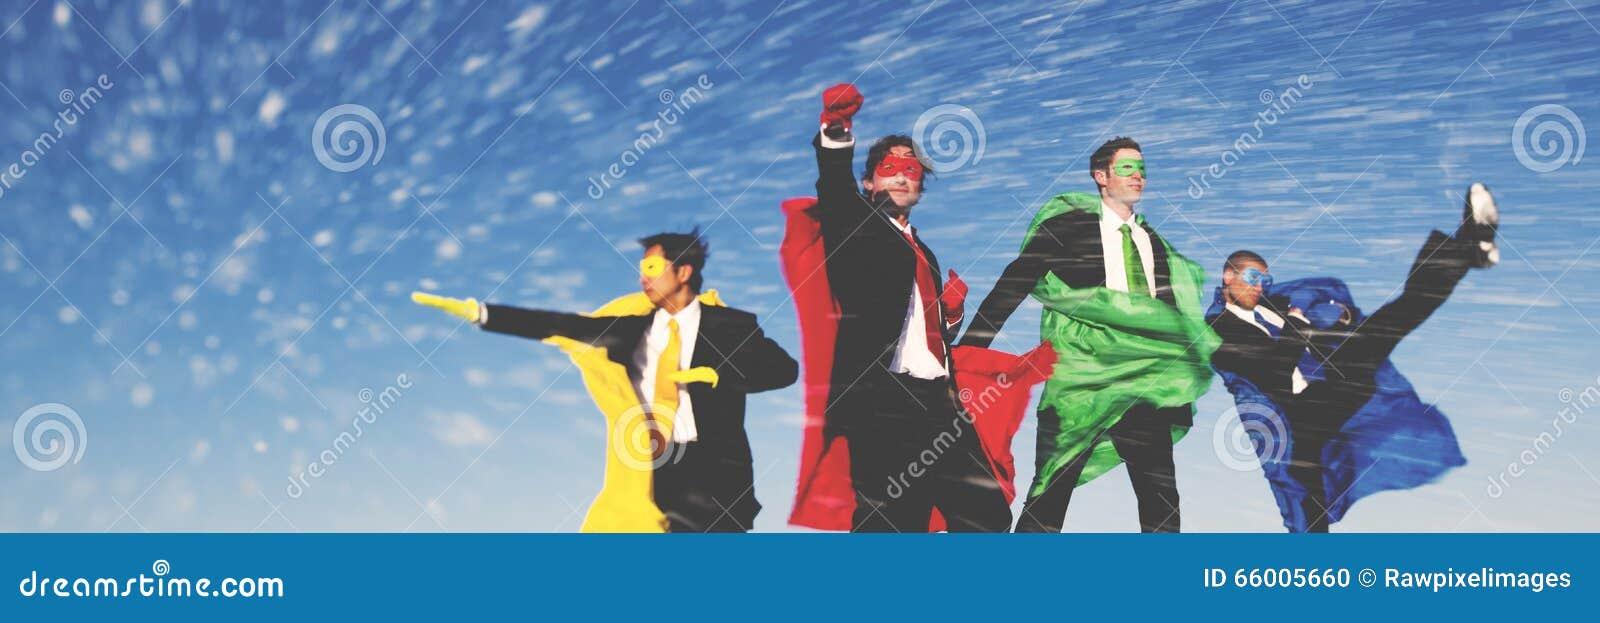 Business Superheroes Winter Snow Rescue Concept